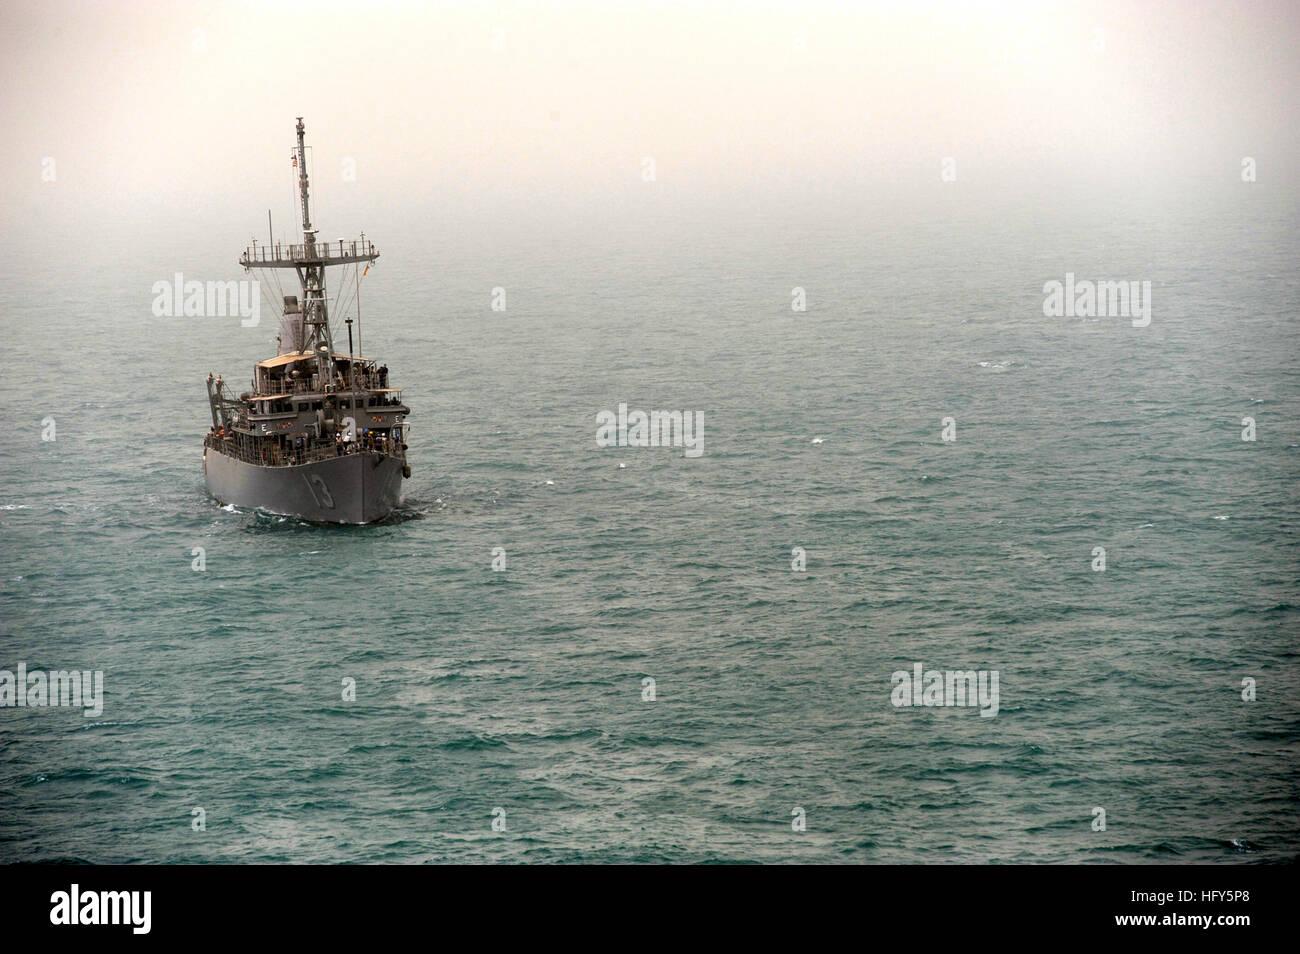 100423-N-0553R-013 ARABIAN GULF (April 23, 2010) The Avenger-class mine countermeasures ship USS Dextrous (MCM 13) - Stock Image